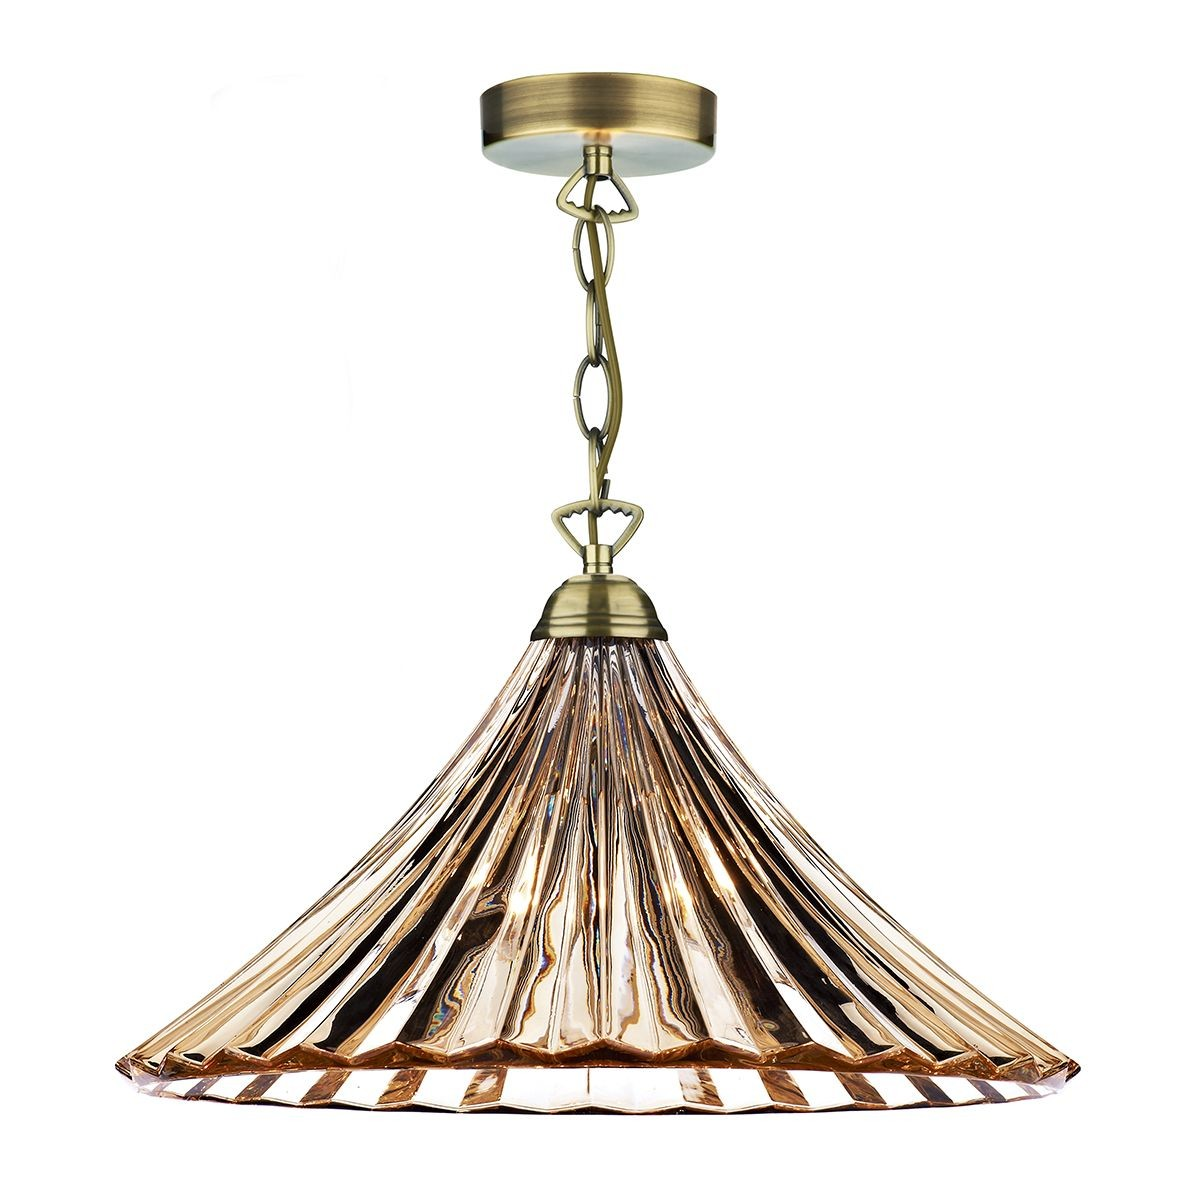 Ardeche 1 Light Large Pendant Light Amber Glass